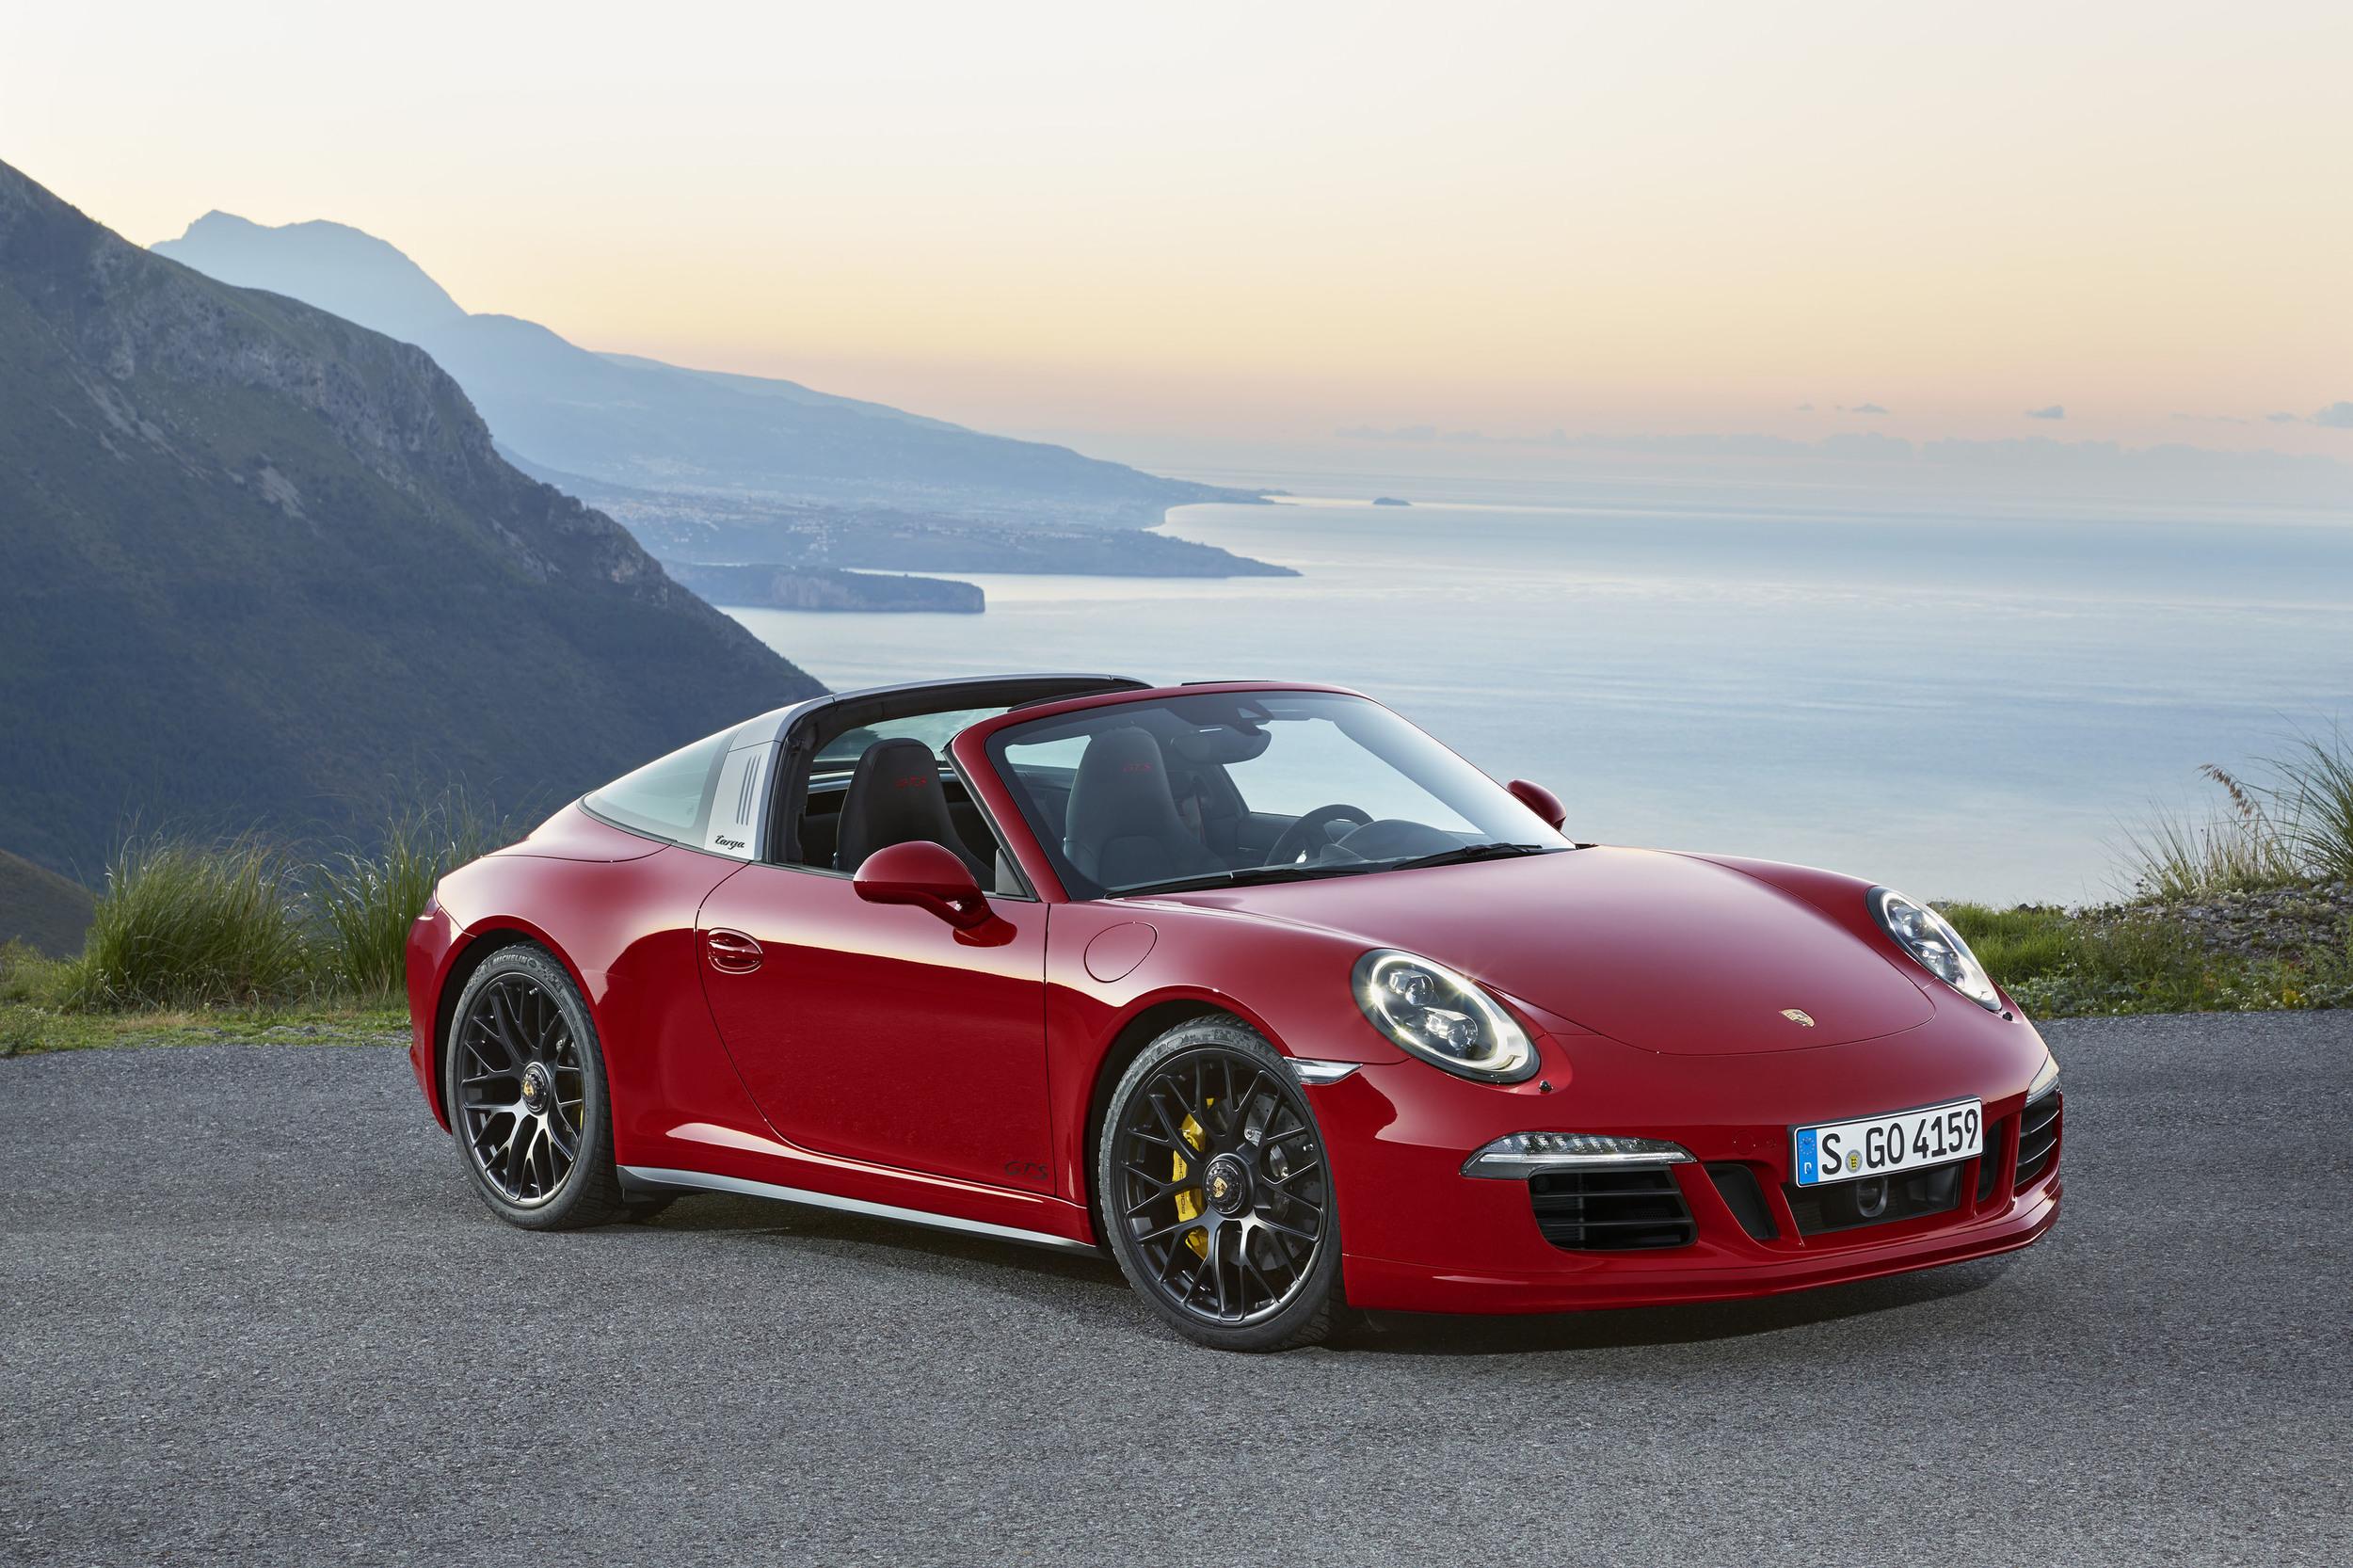 Porsche 911 Targa 4 GTS 2015 02